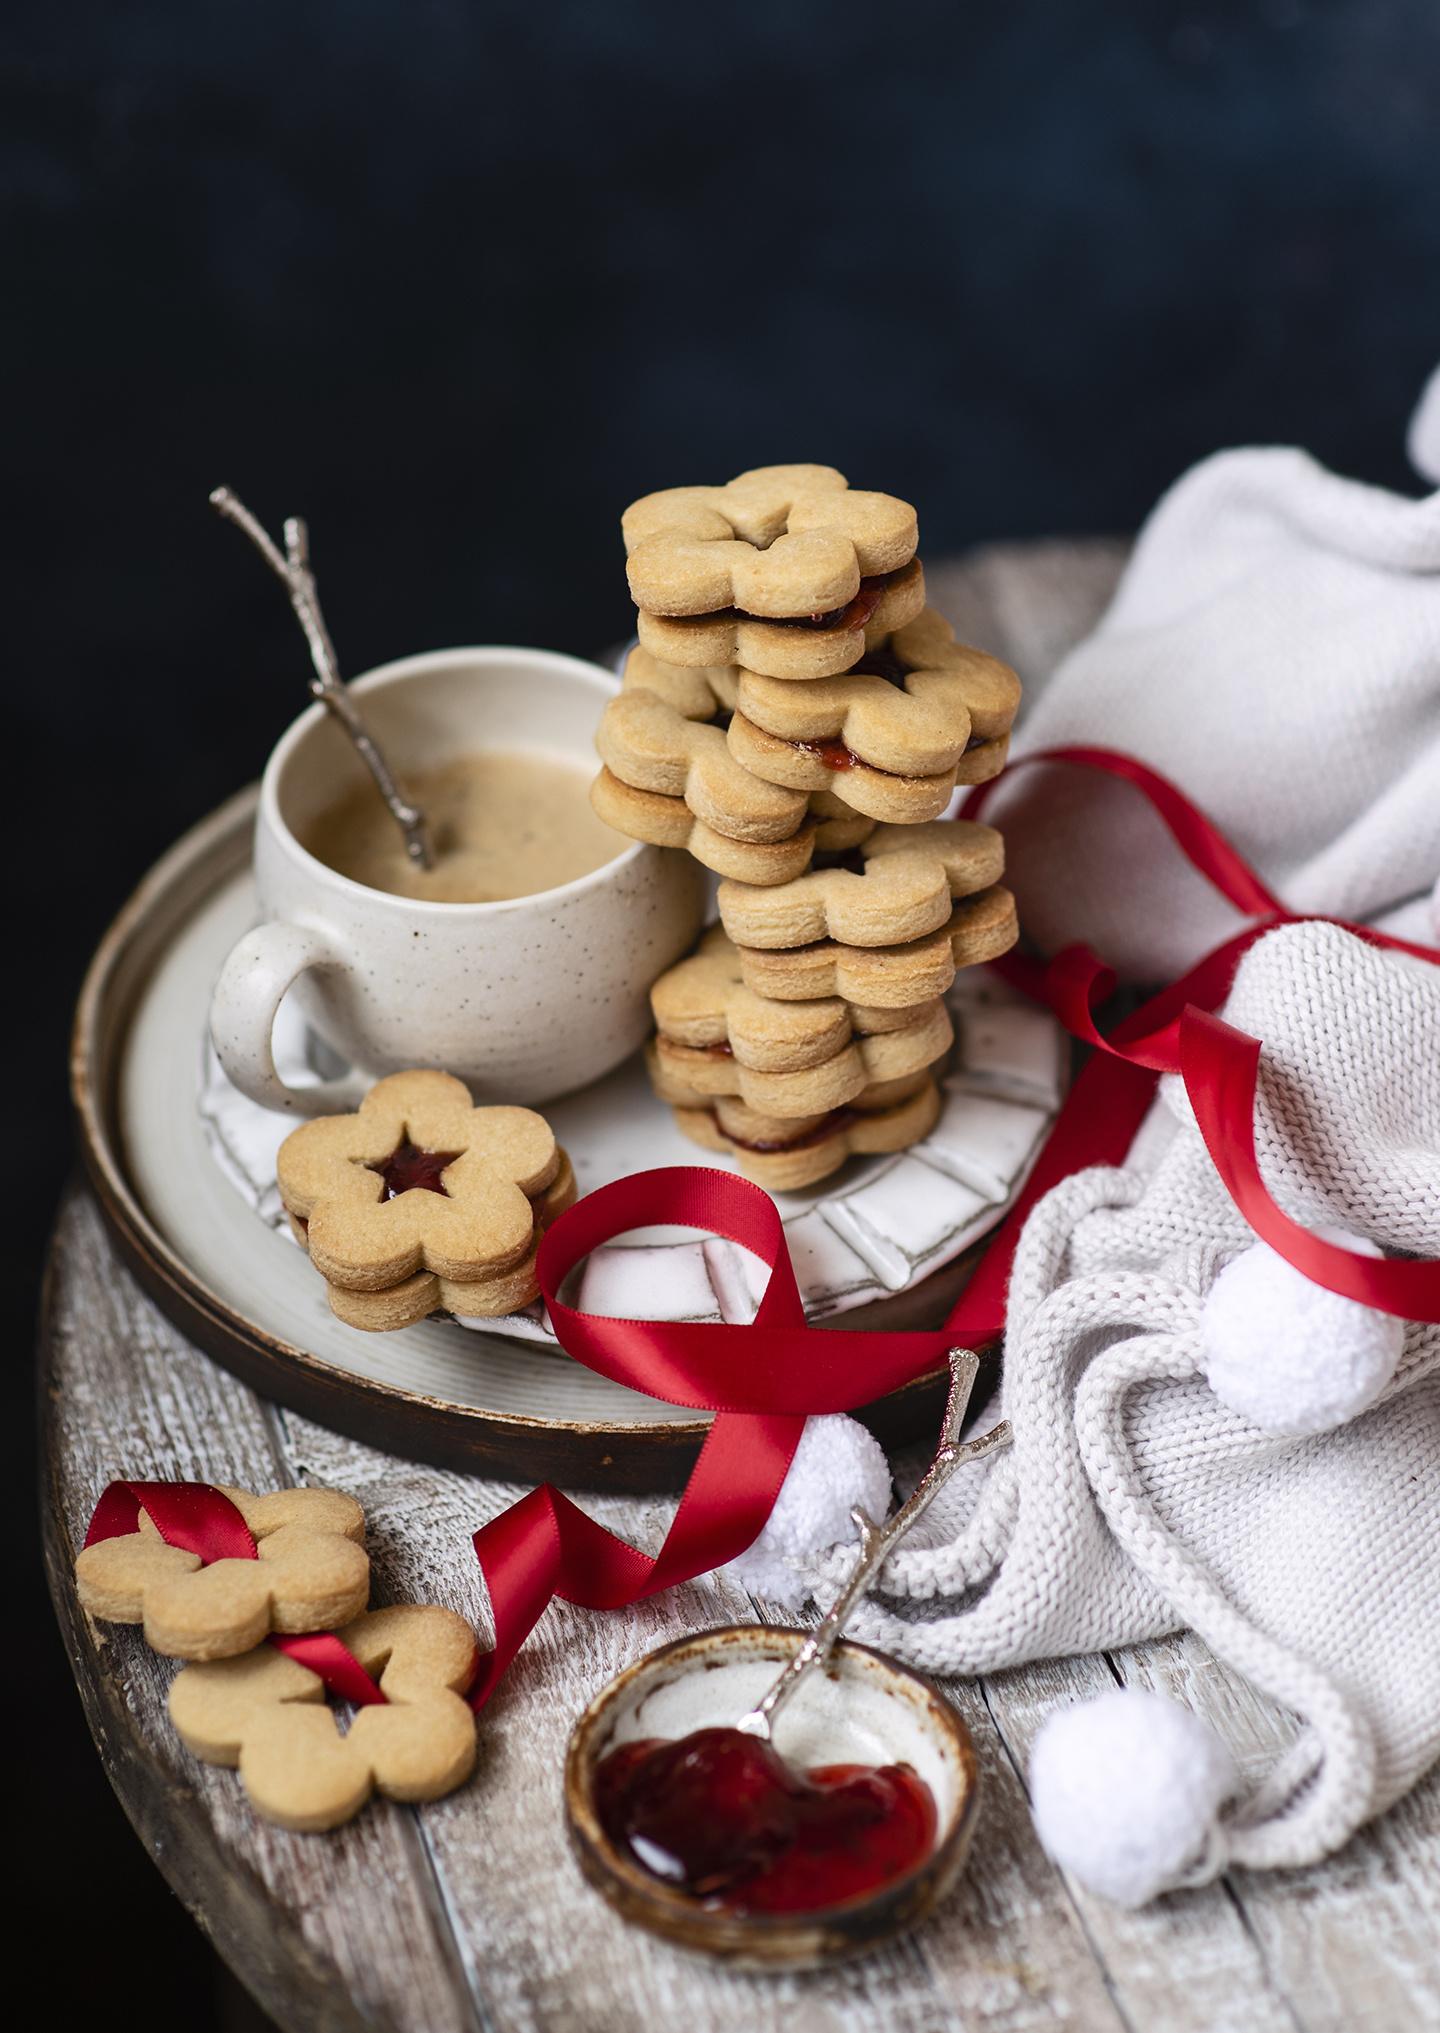 Desktop Wallpapers Jam Coffee Cappuccino Cup Food Ribbon Cookies Still-life  for Mobile phone Varenye Fruit preserves